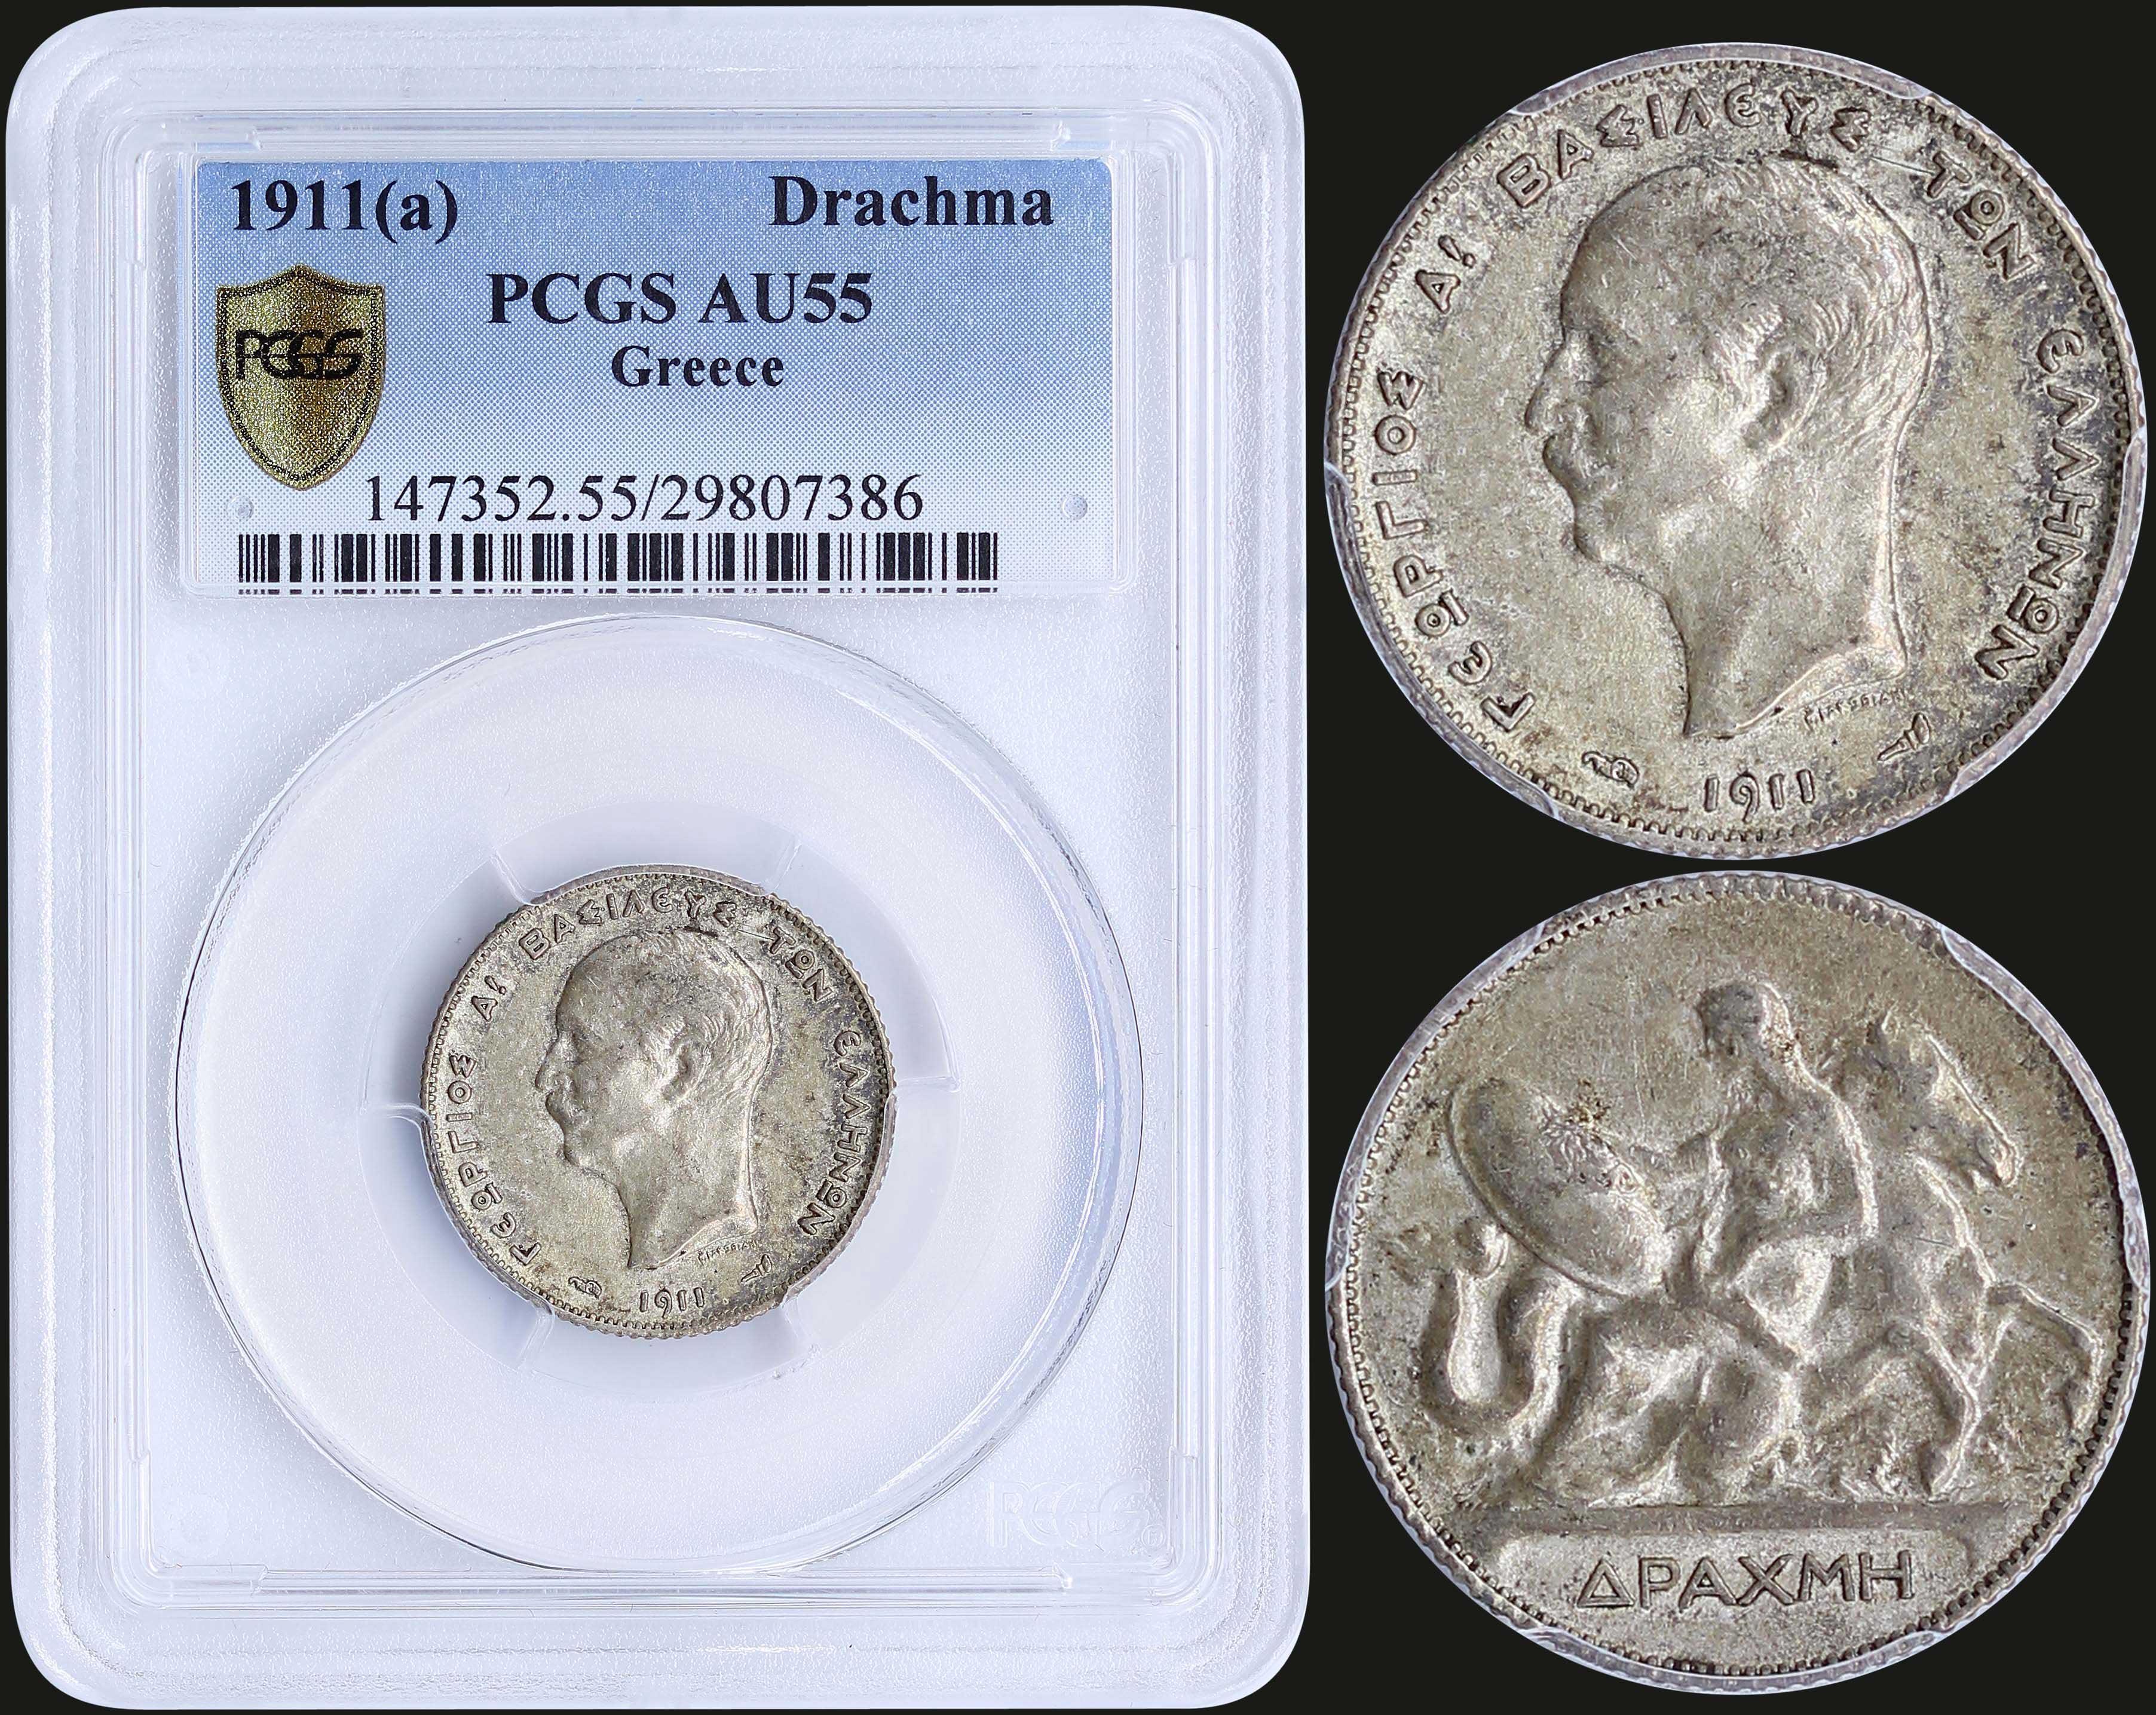 Lot 8111 - -  COINS & TOKENS king george i -  A. Karamitsos Public & Live Bid Auction 649 Coins, Medals & Banknotes